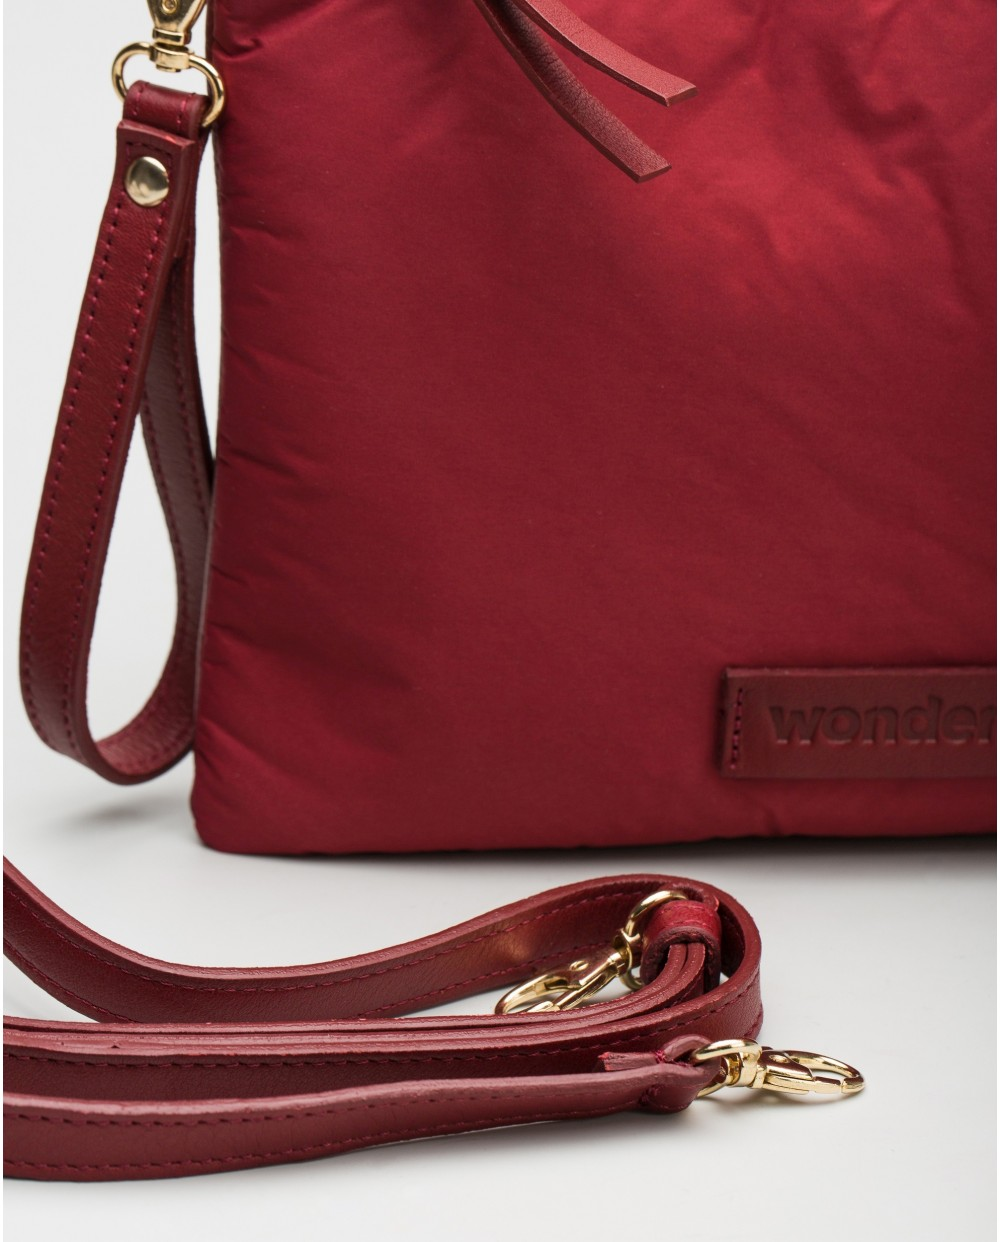 Wonders-Bags-Fabric handbag